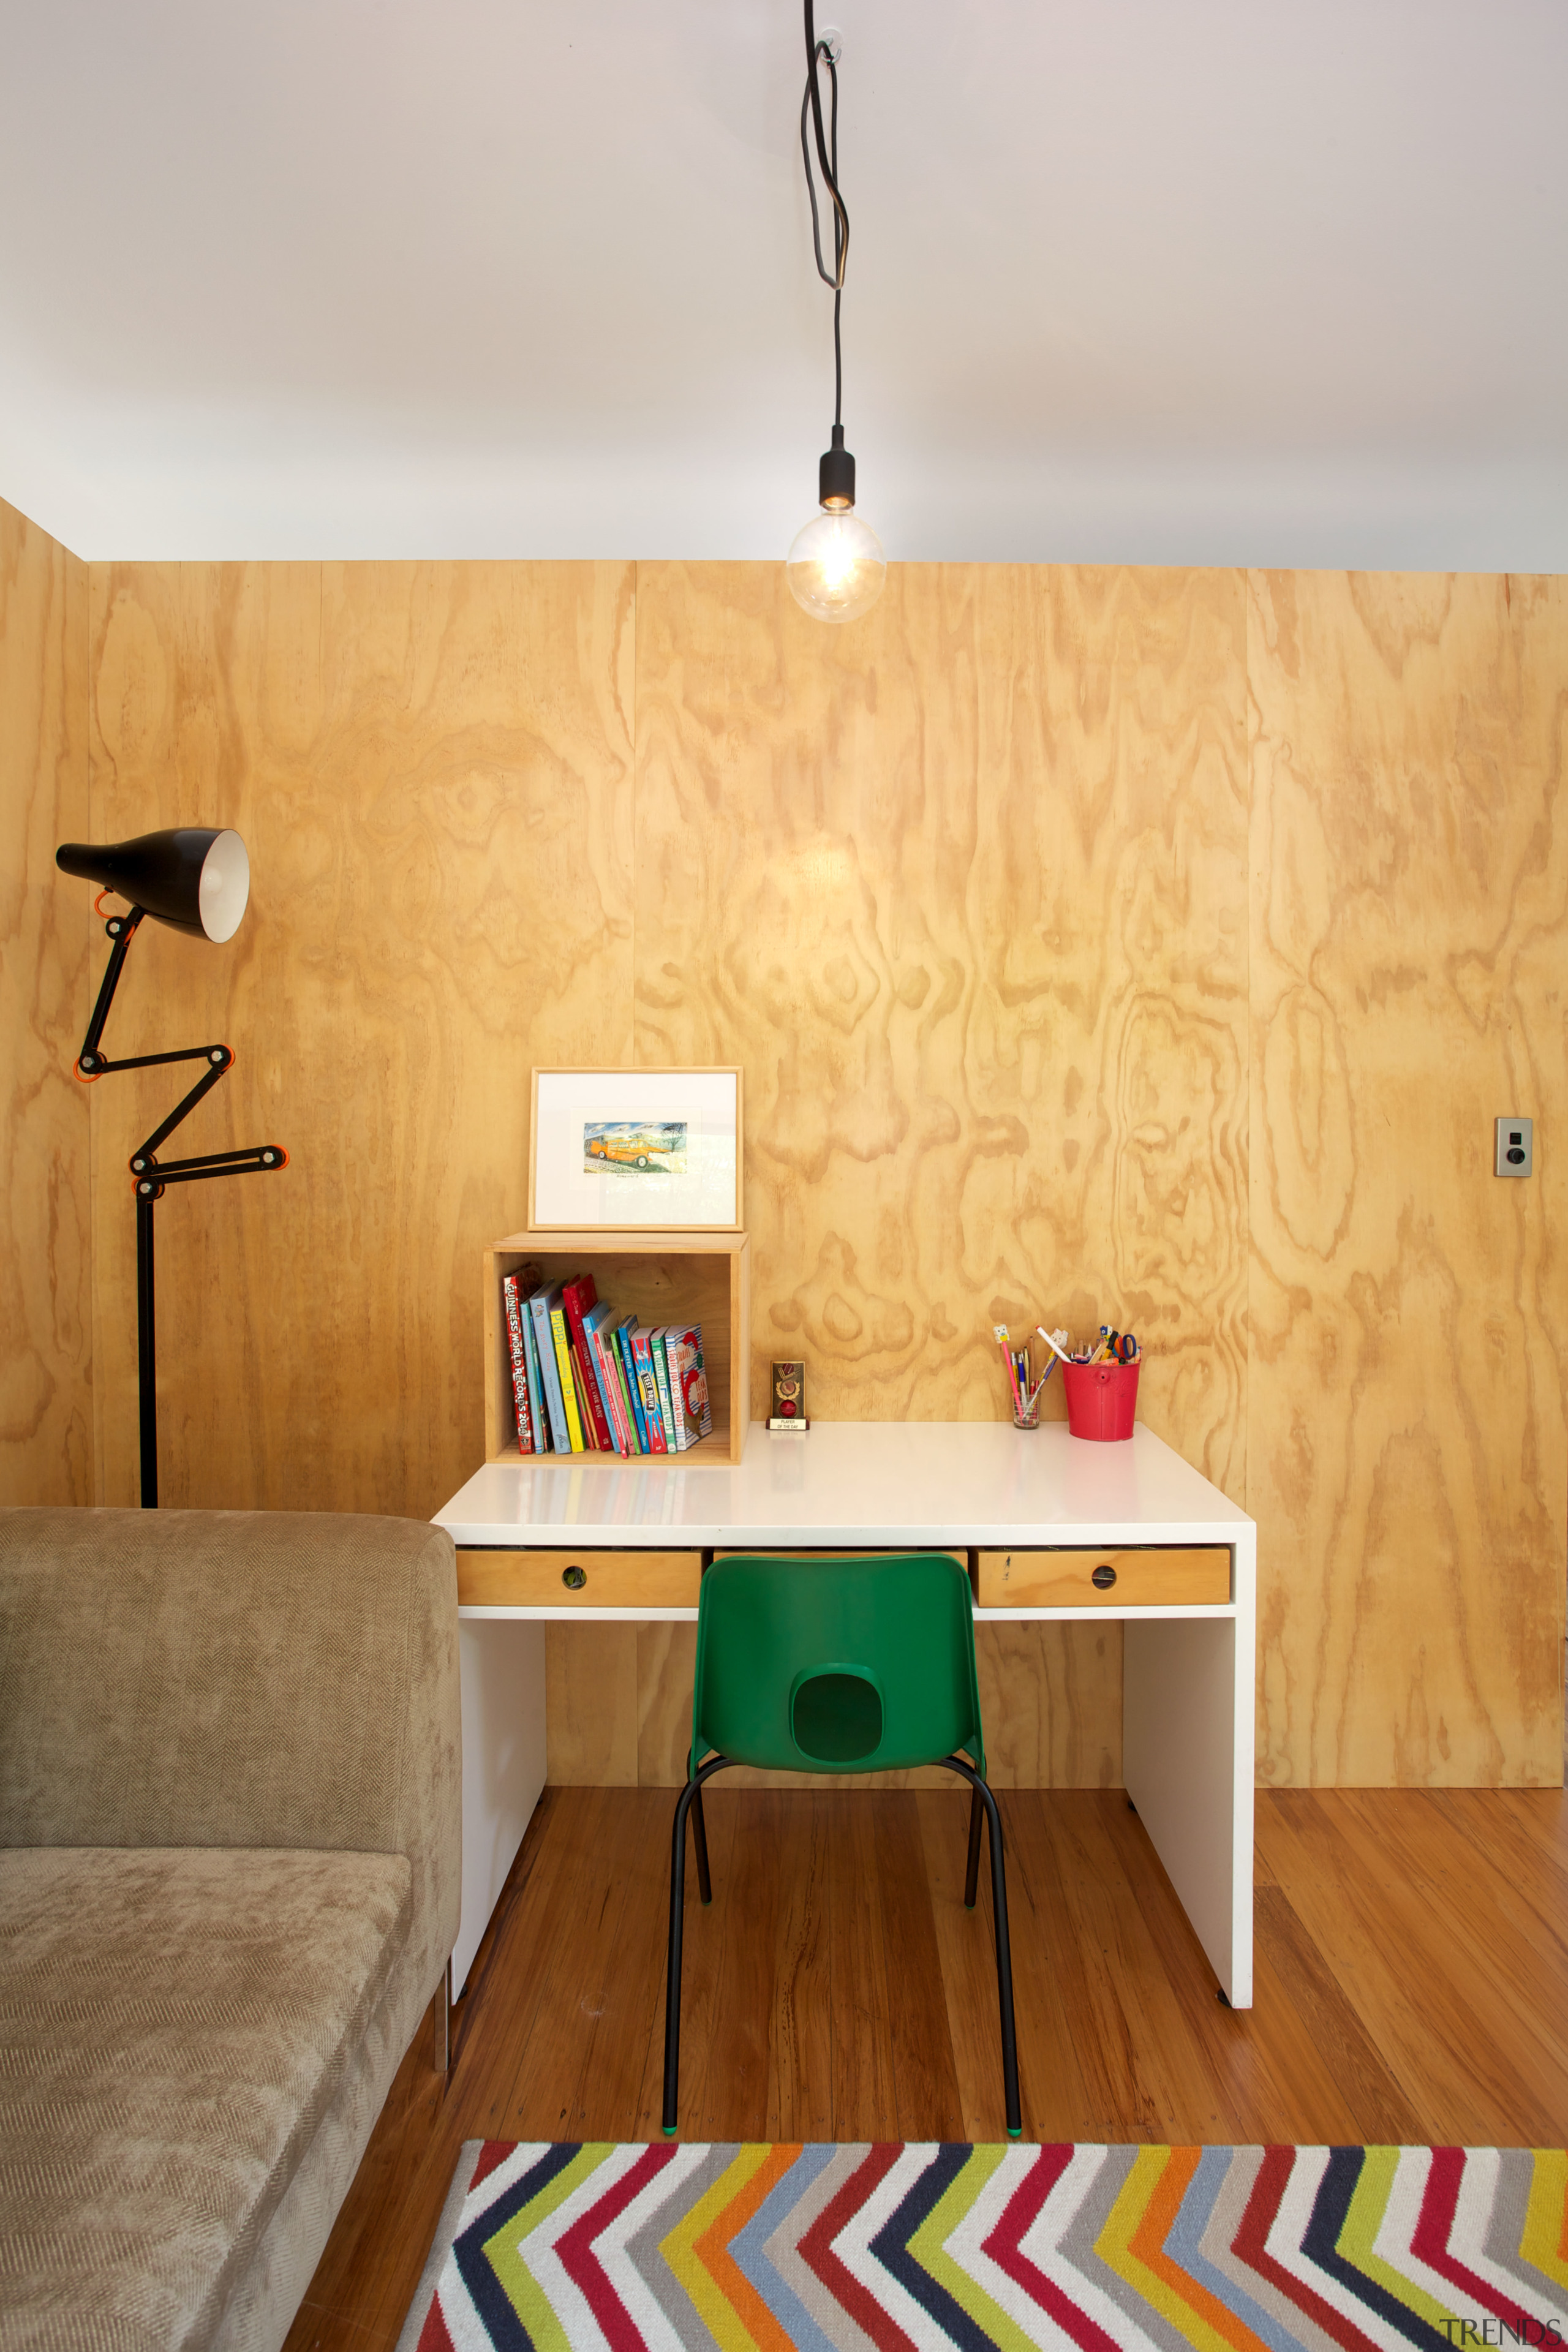 Pine plywood lines the interior of the black ceiling, desk, floor, flooring, furniture, hardwood, home, house, interior design, living room, plywood, product design, room, shelf, table, wall, wood, orange, gray, brown